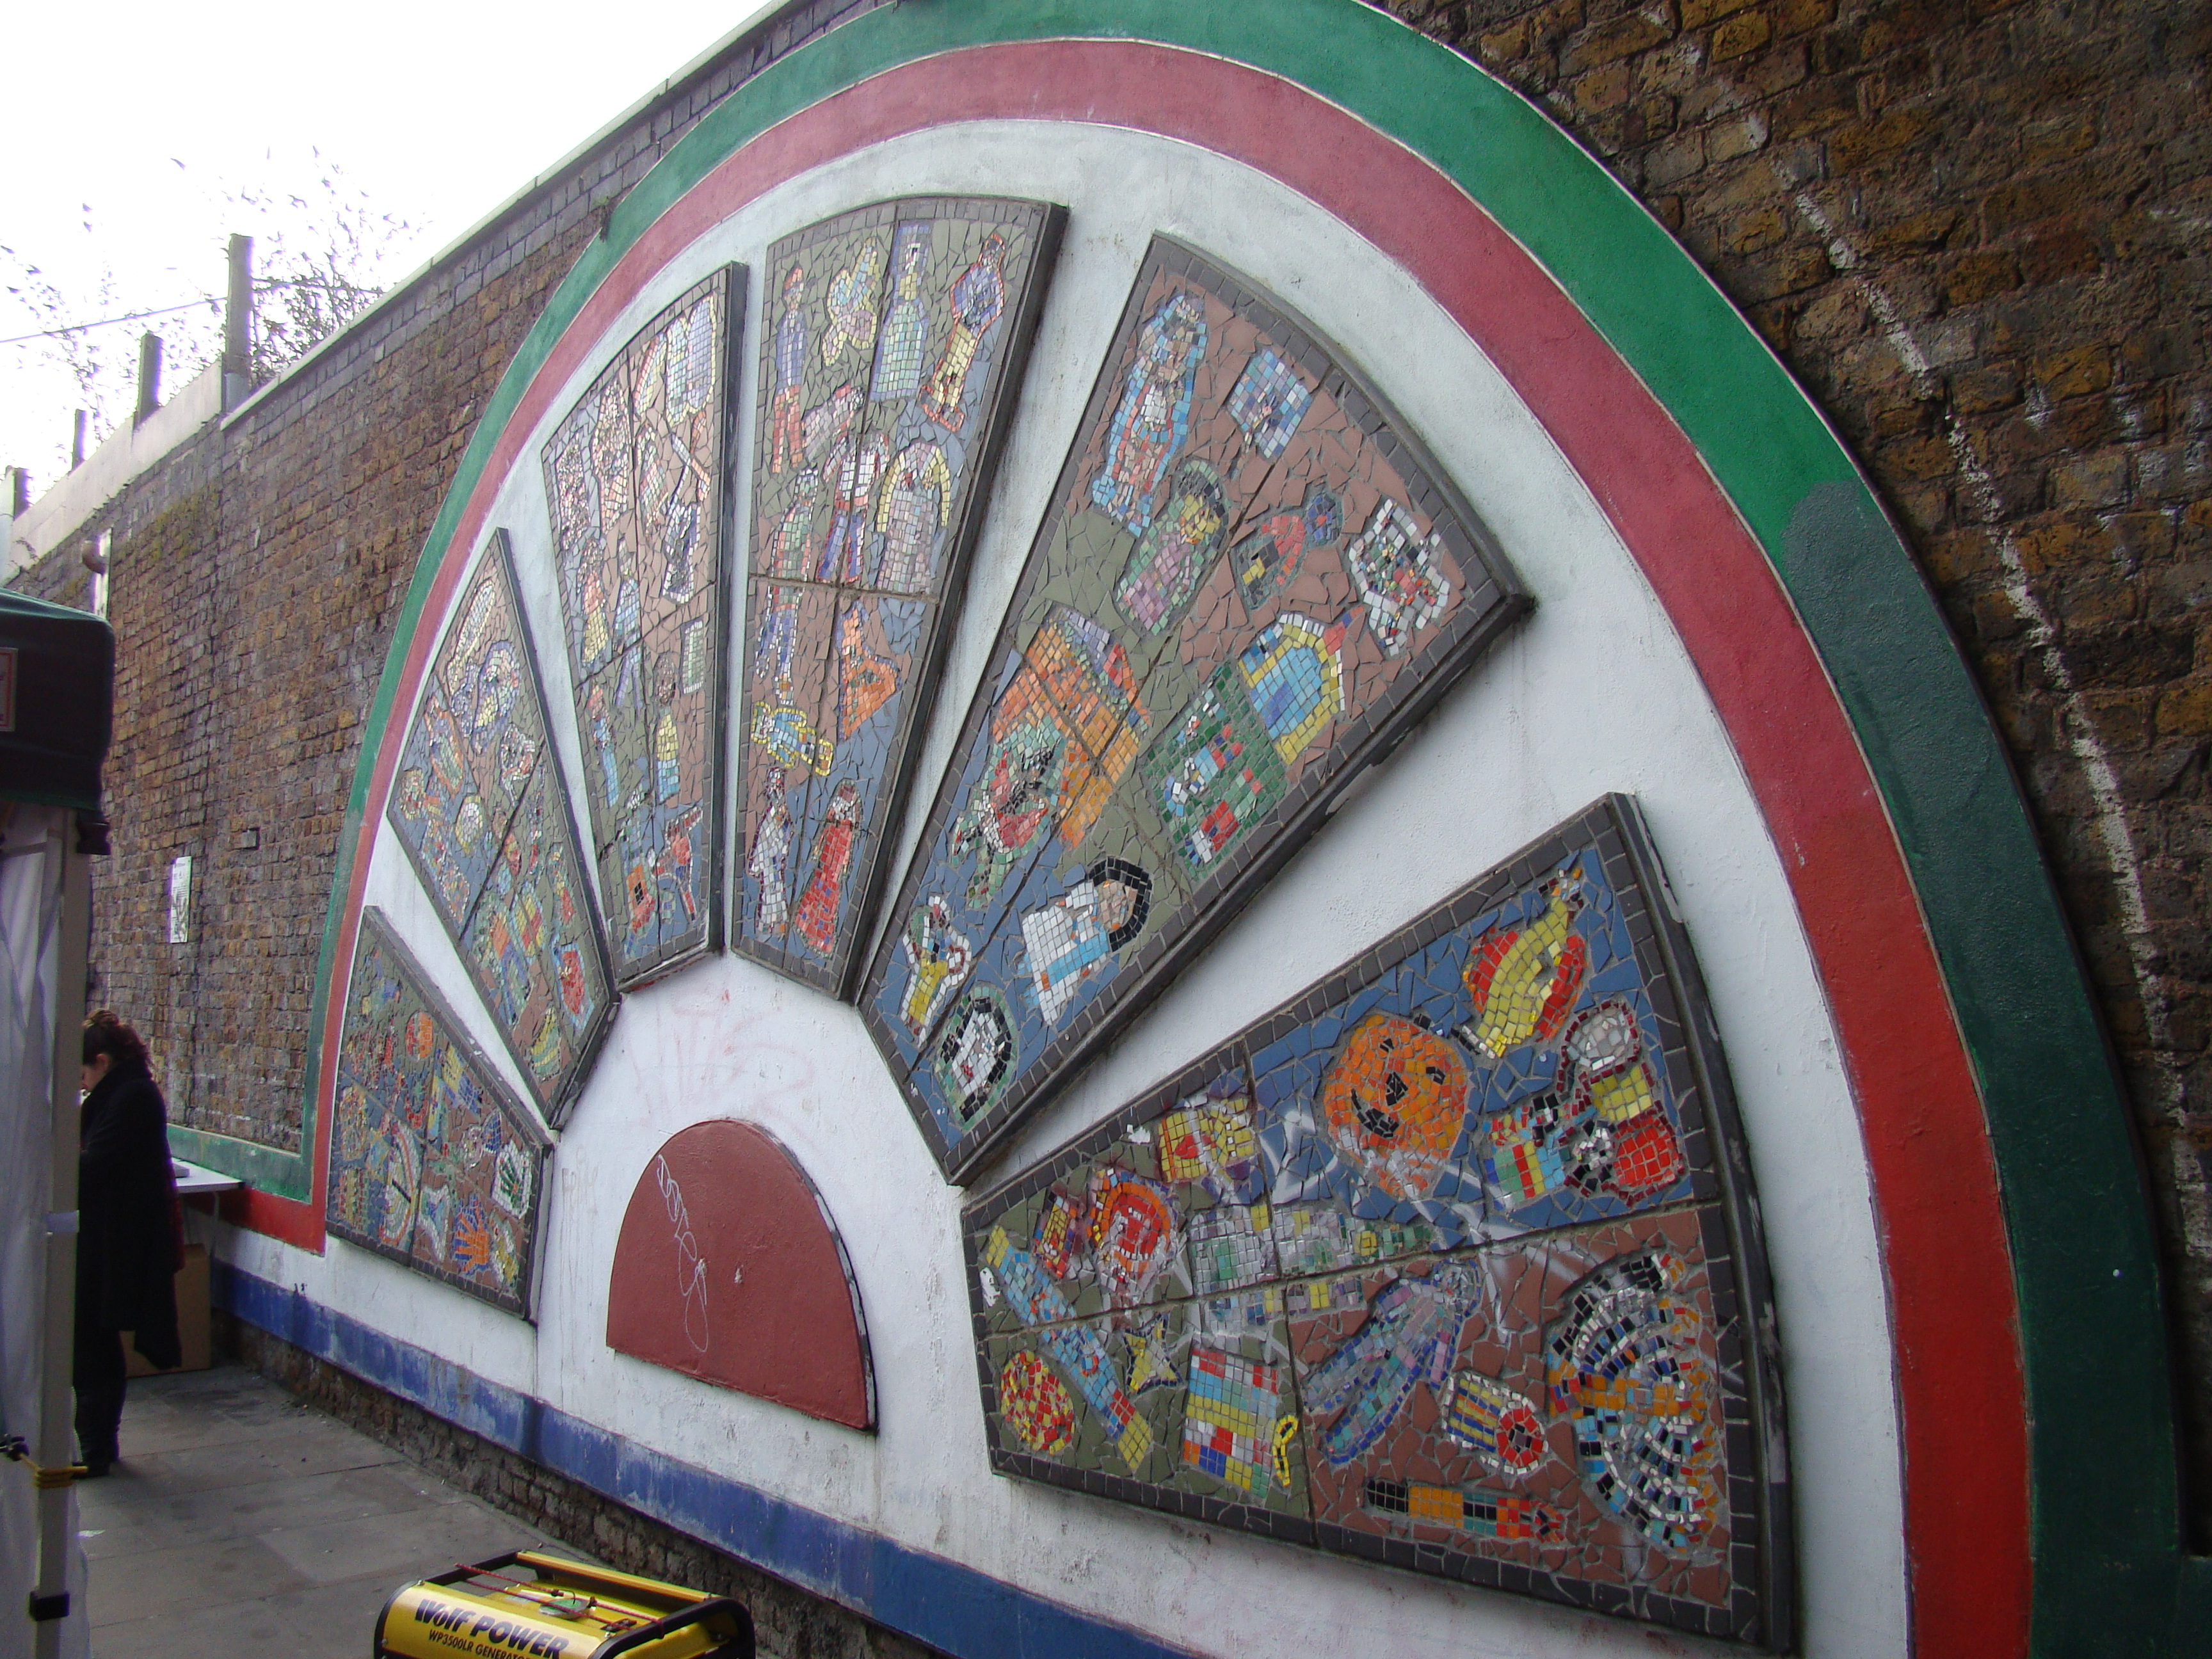 Description Mosaic design on brick wall on Brick Lane   geograph org